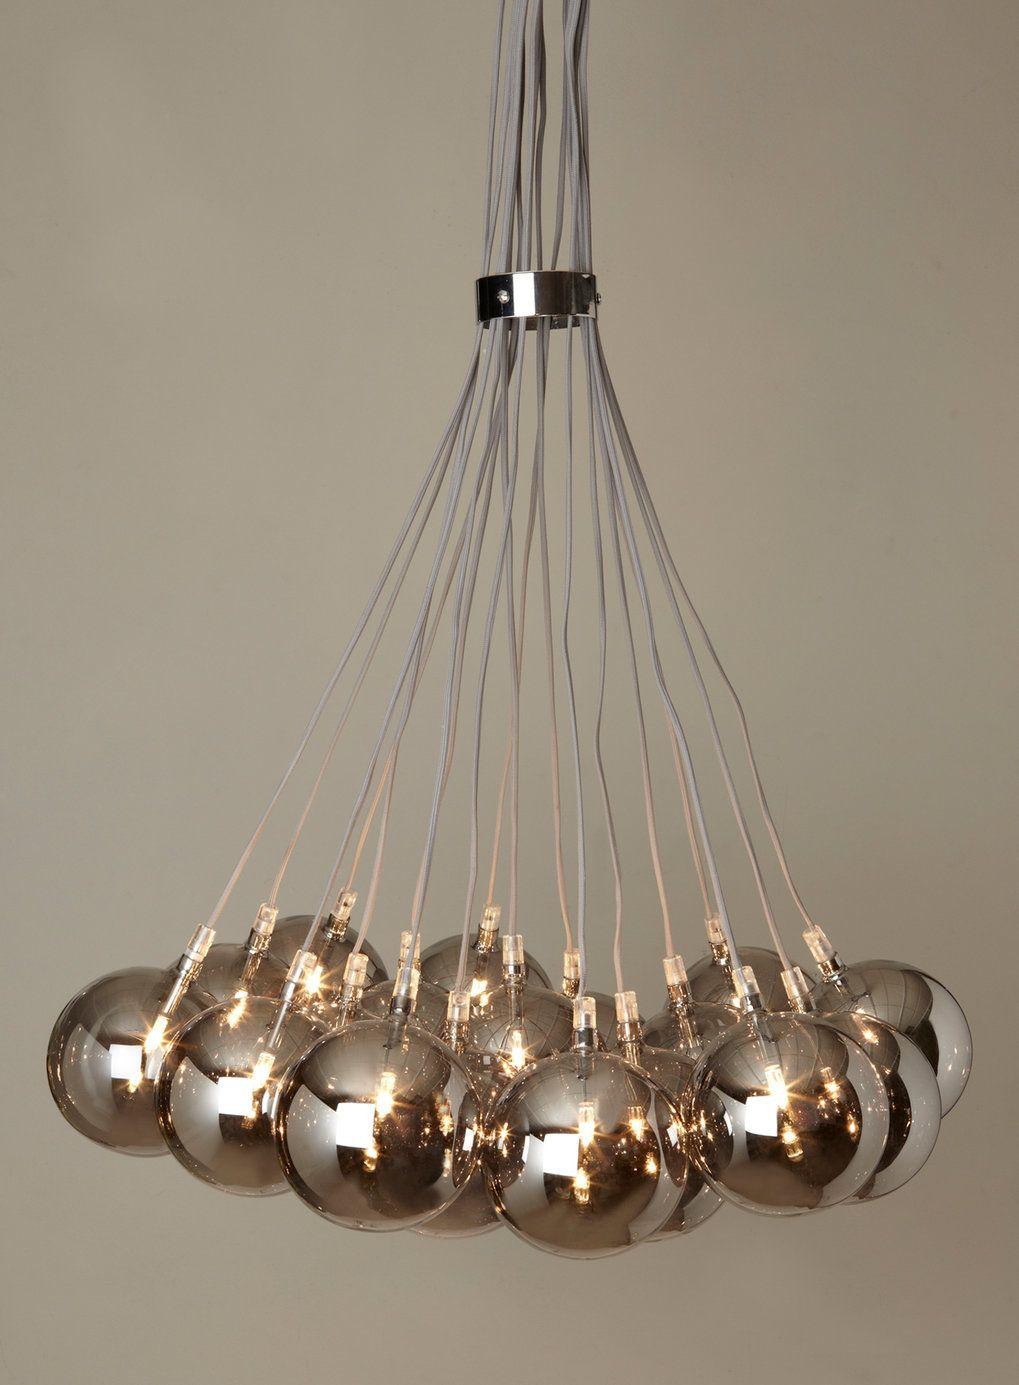 Malachy 18 light Cluster - All Lighting - Home, Lighting & Furniture - BHS